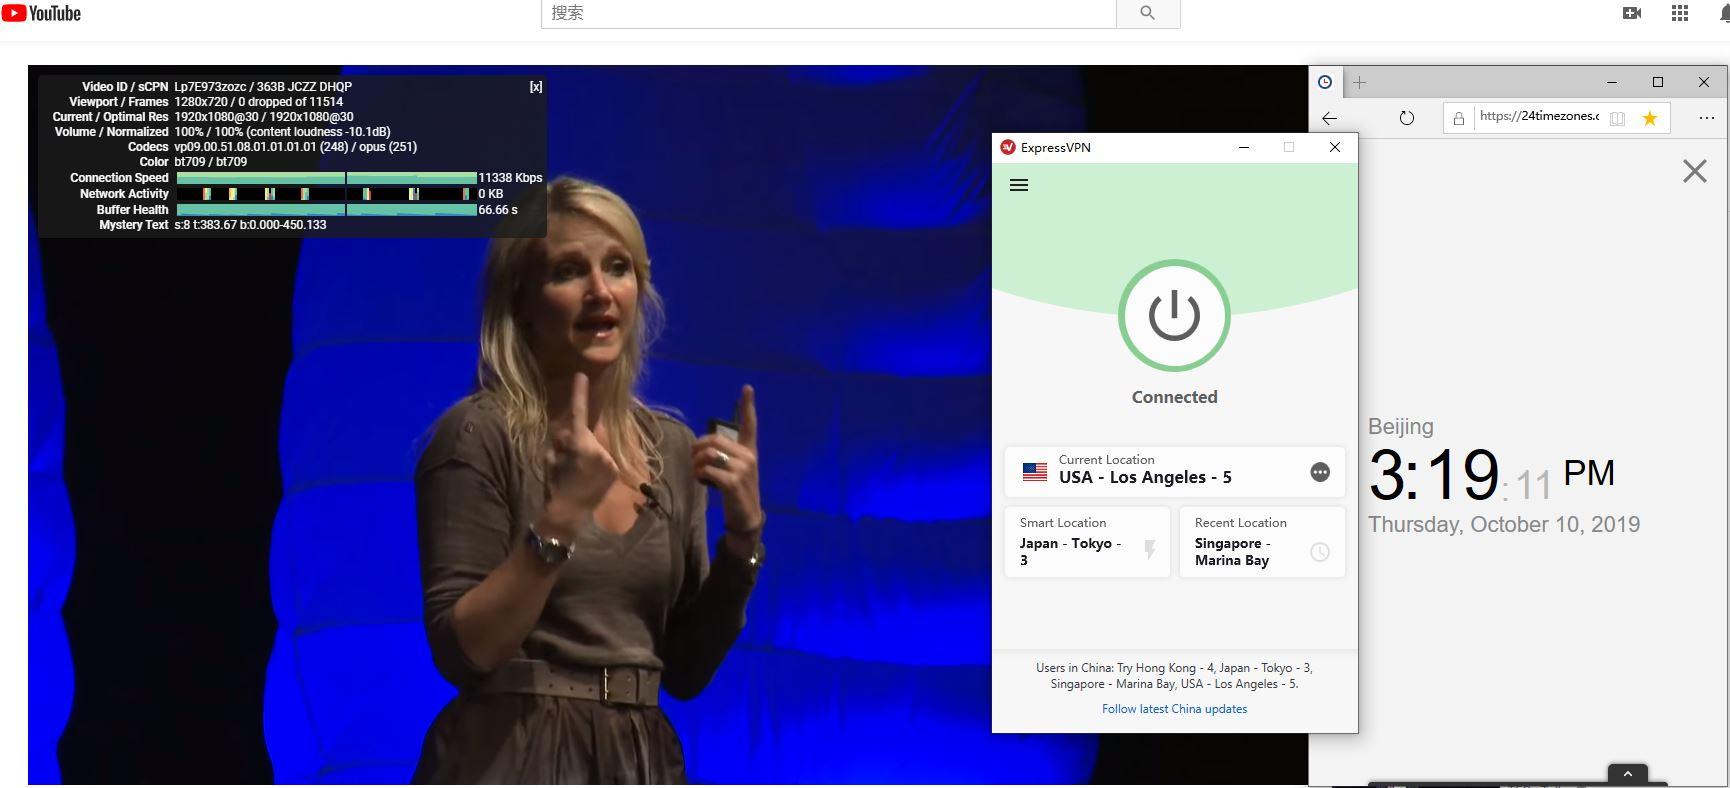 Windows ExpressVPN USA - Las Angeles - 5 中国VPN翻墙 科学上网 Youtube测速-20191010